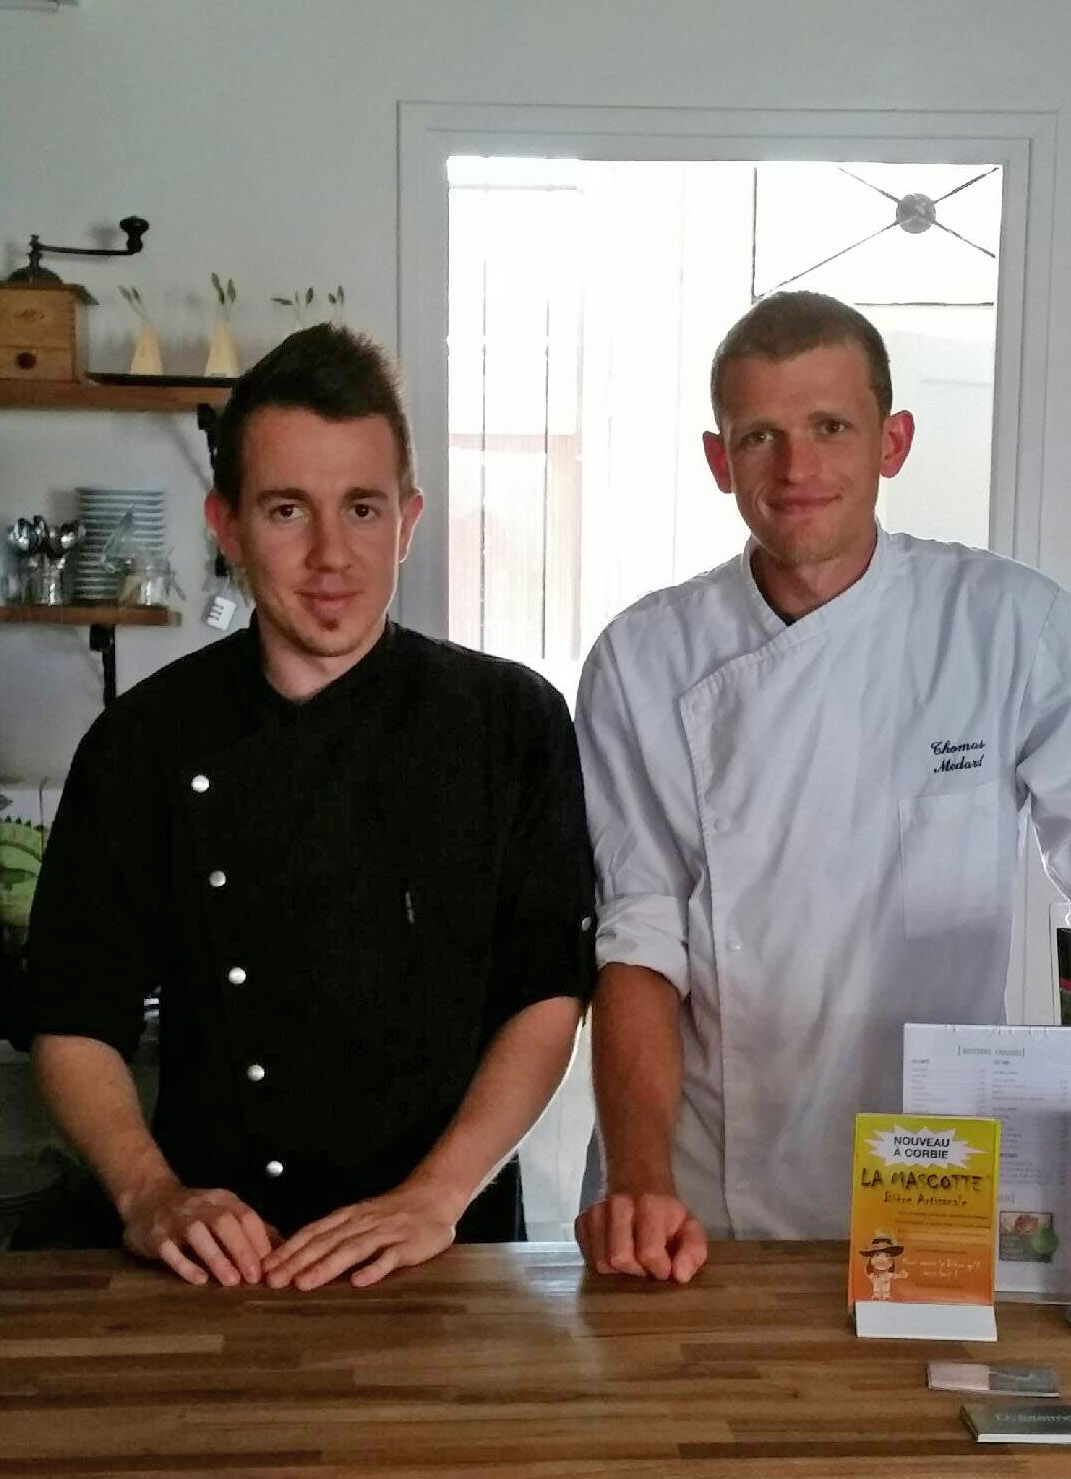 Thomas Medard et Christophe Renaudin, Restaurant Delissimo, à Amiens